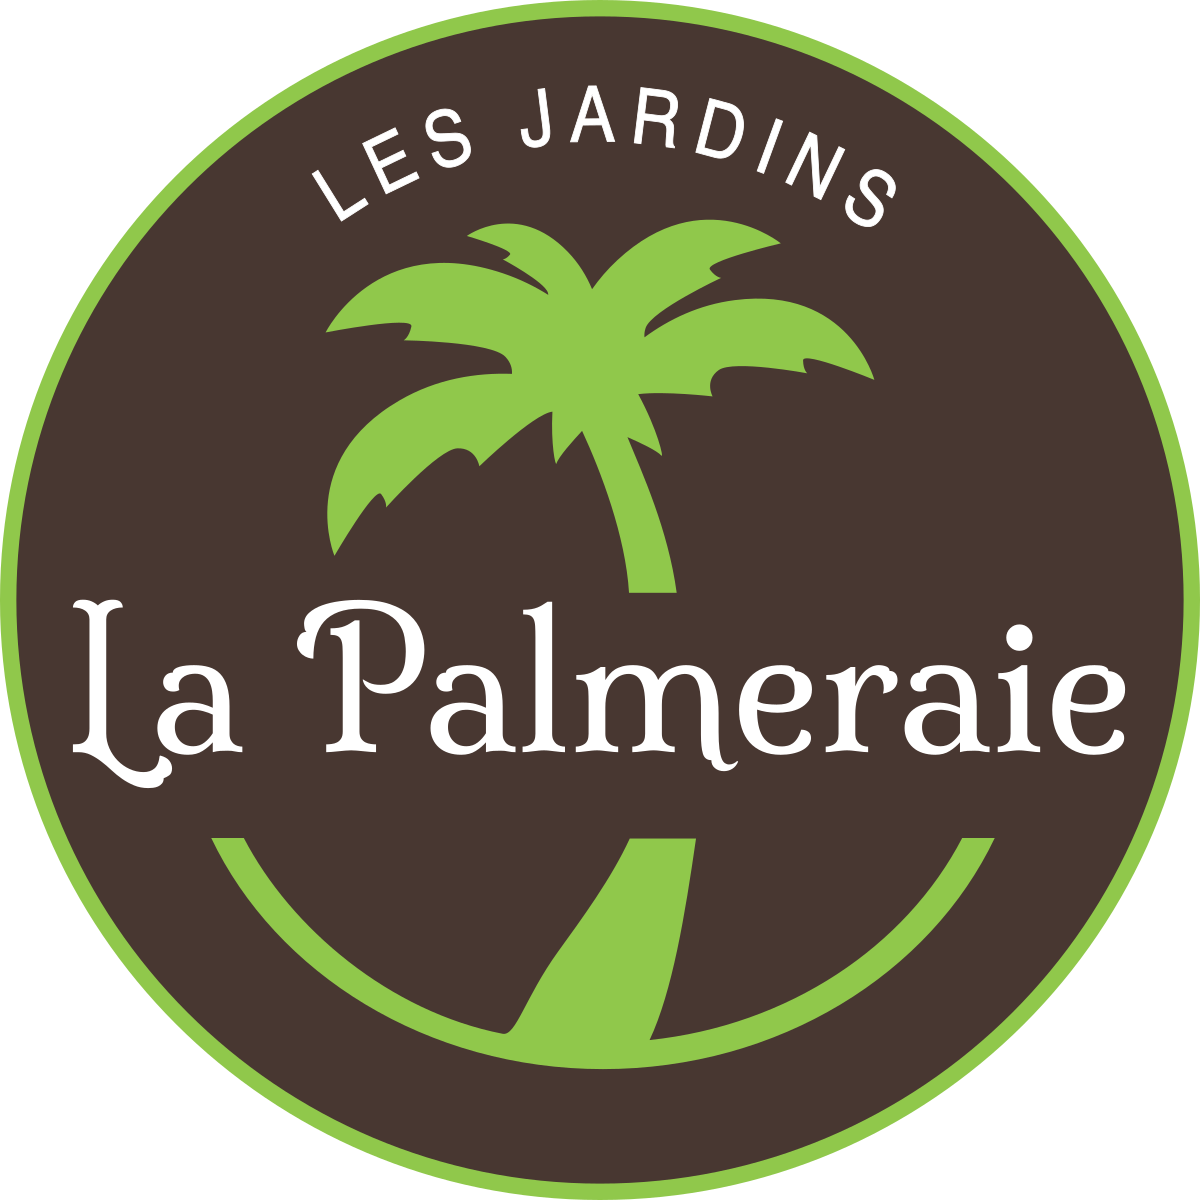 Les Jardins La Palmeraie